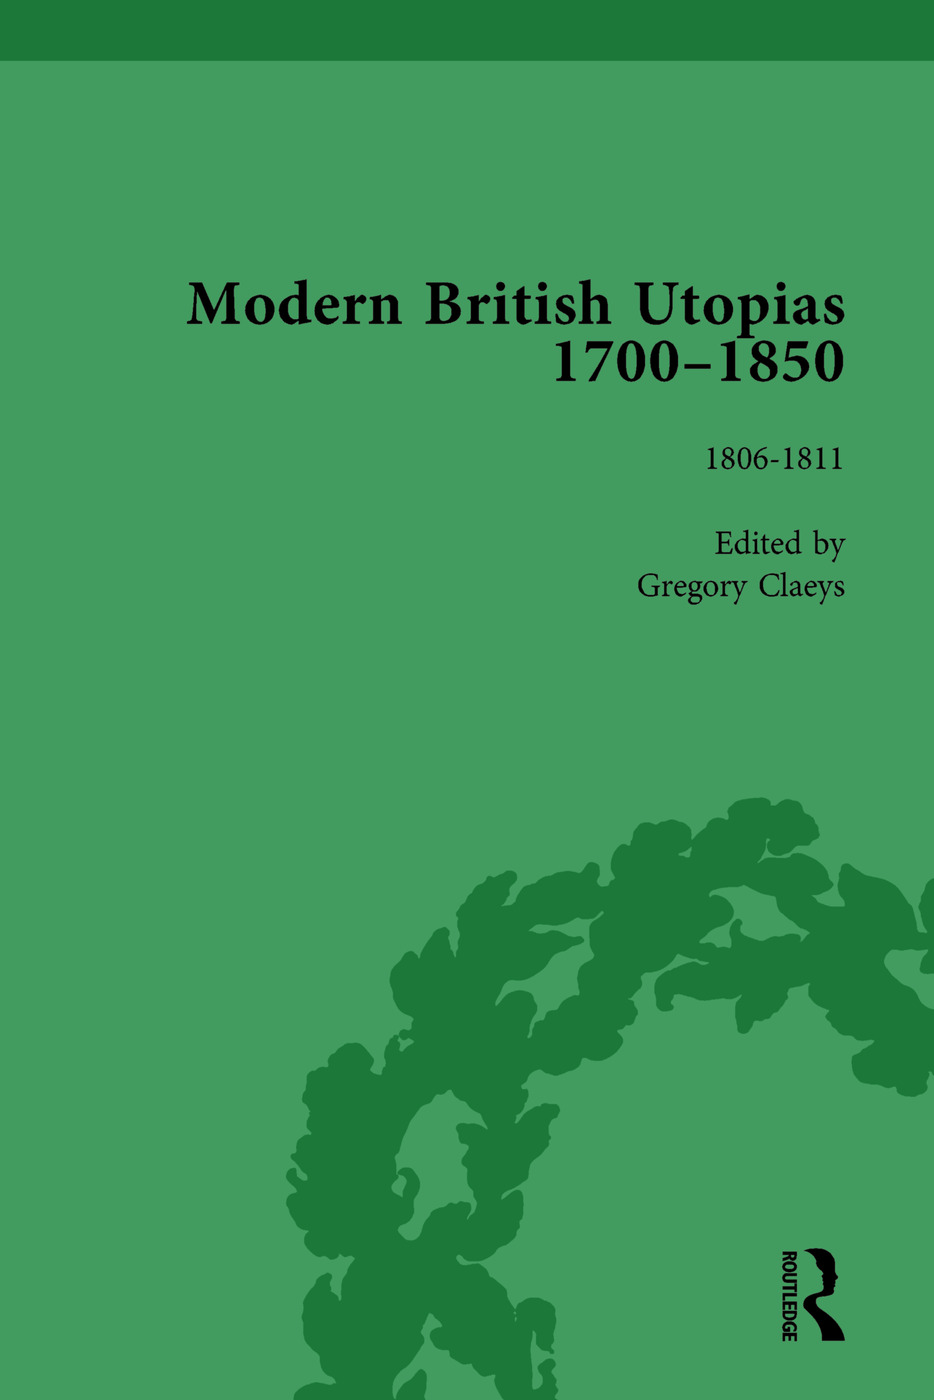 Modern British Utopias, 1700-1850 Vol 5: 1st Edition (Hardback) book cover